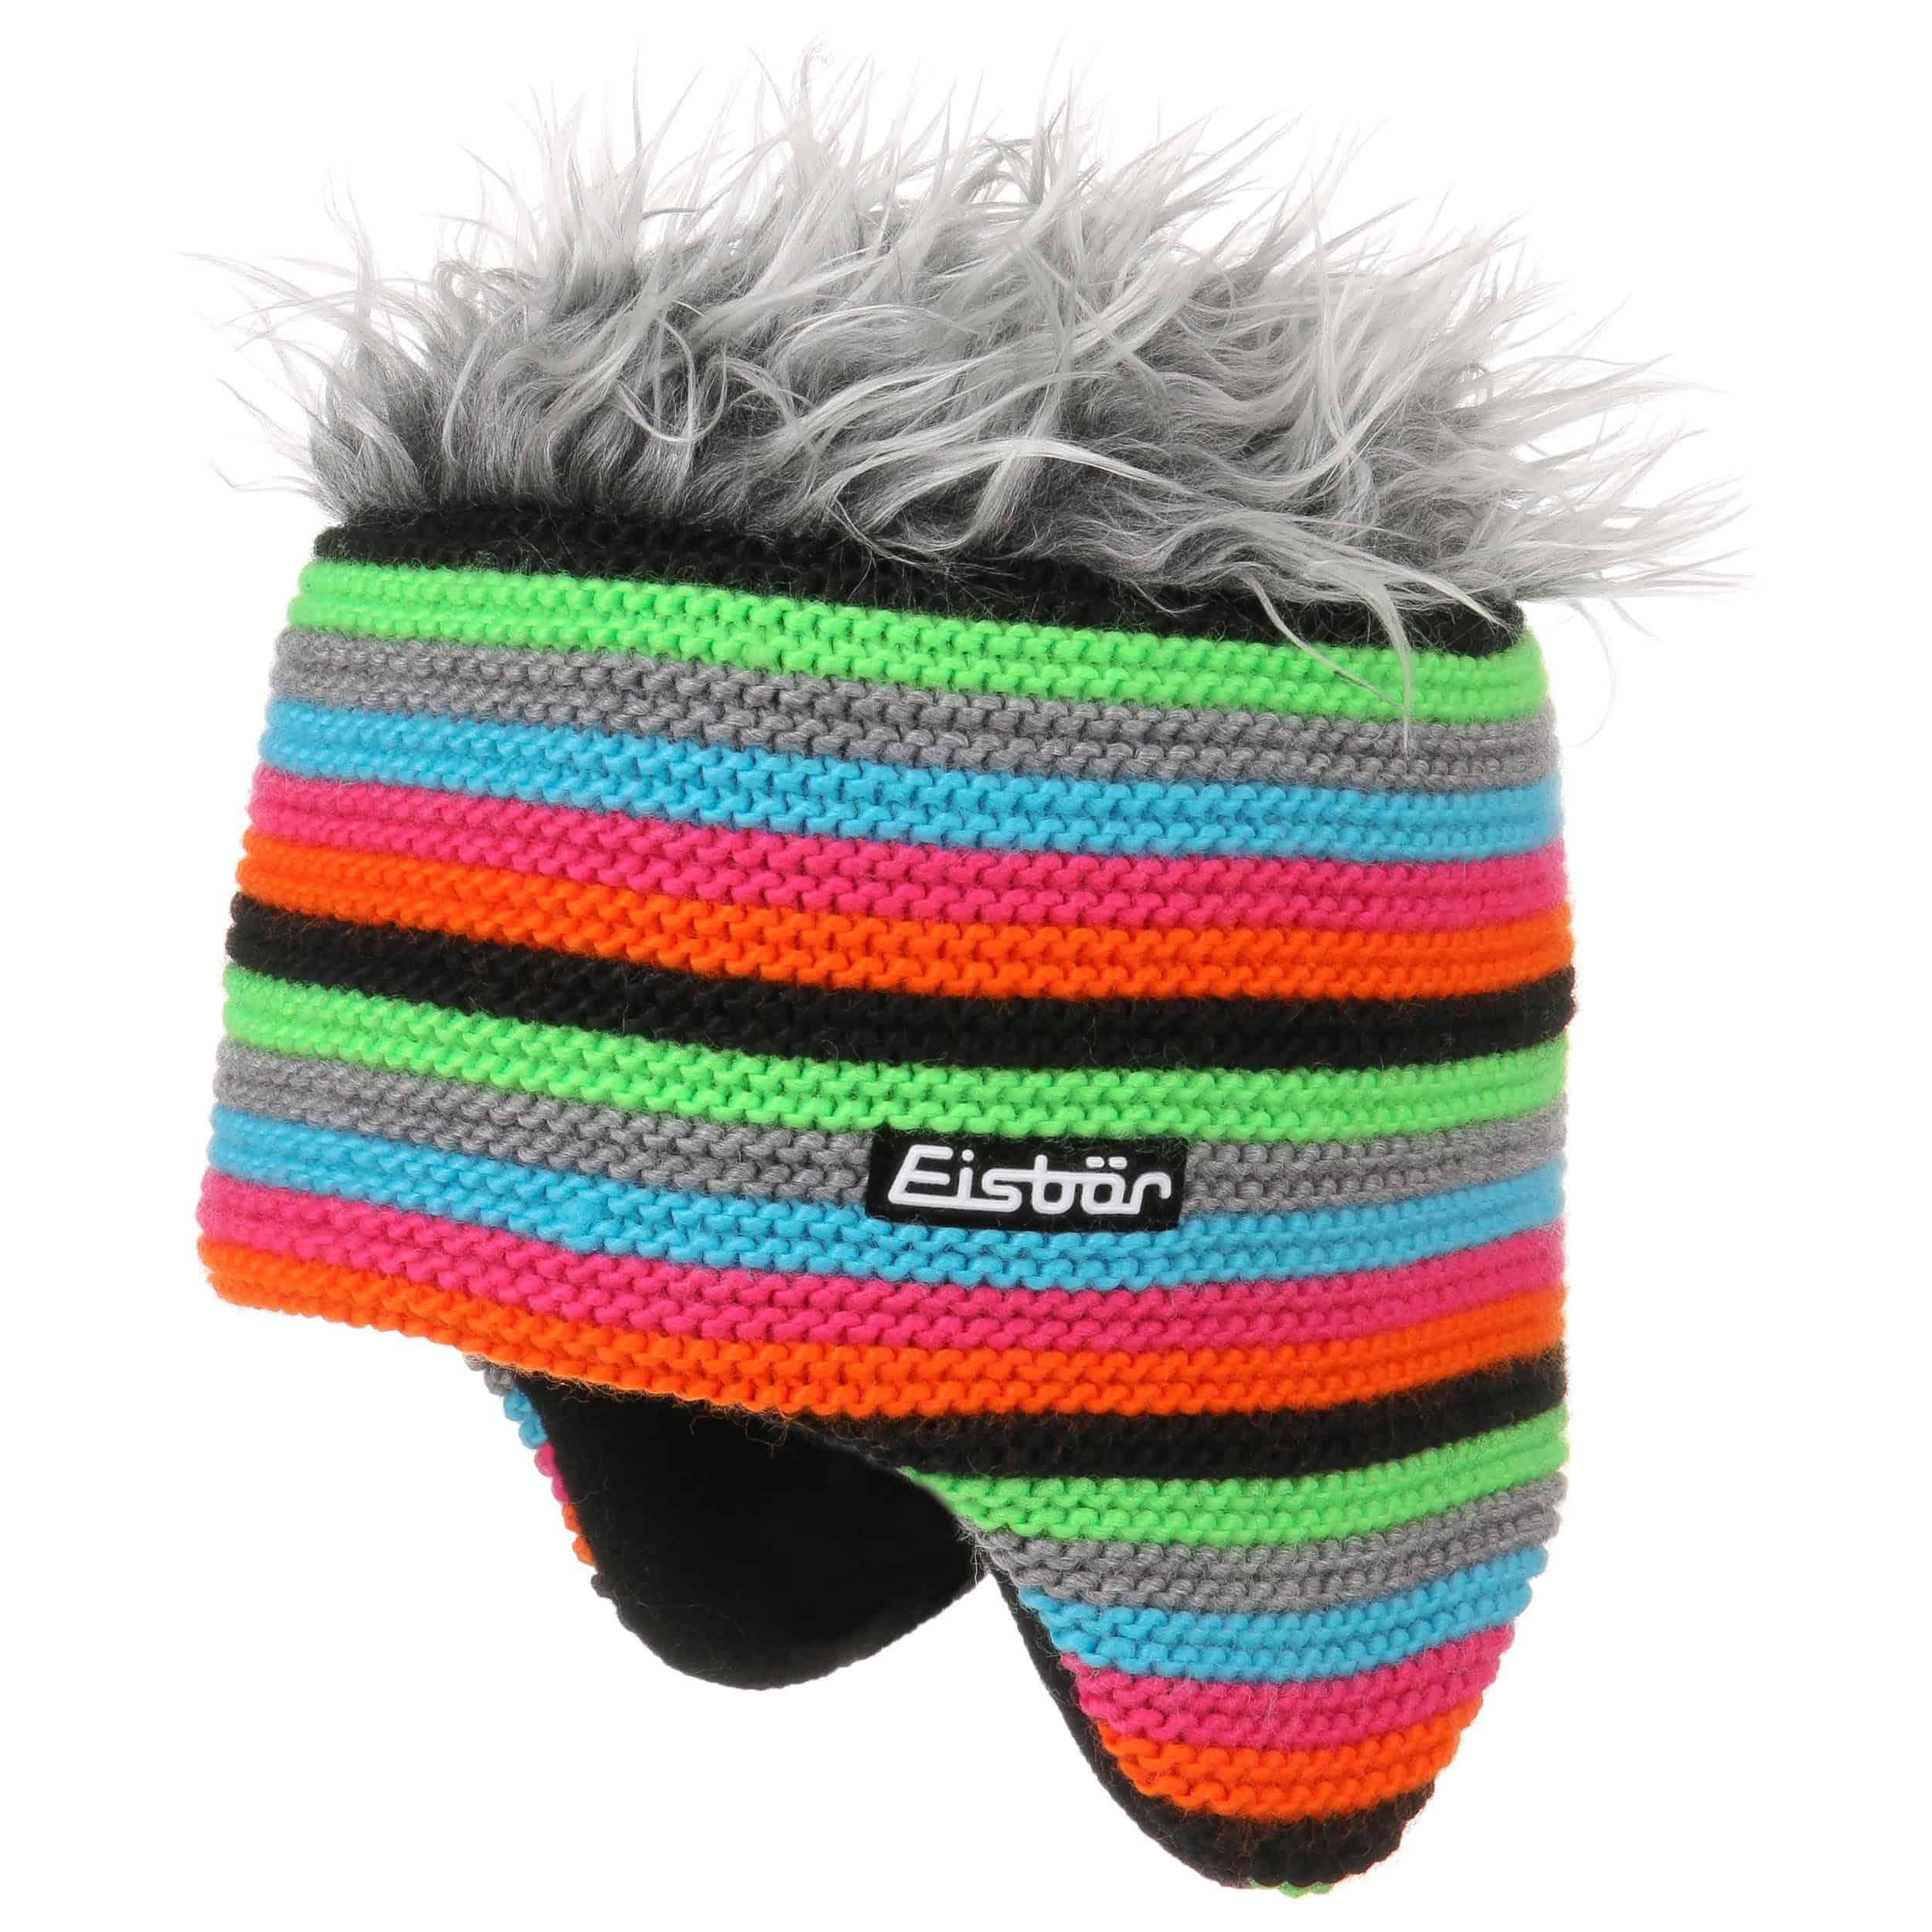 ... Funky Cocker Knit Hat by Eisbär - black 4 ... 59e592c206e